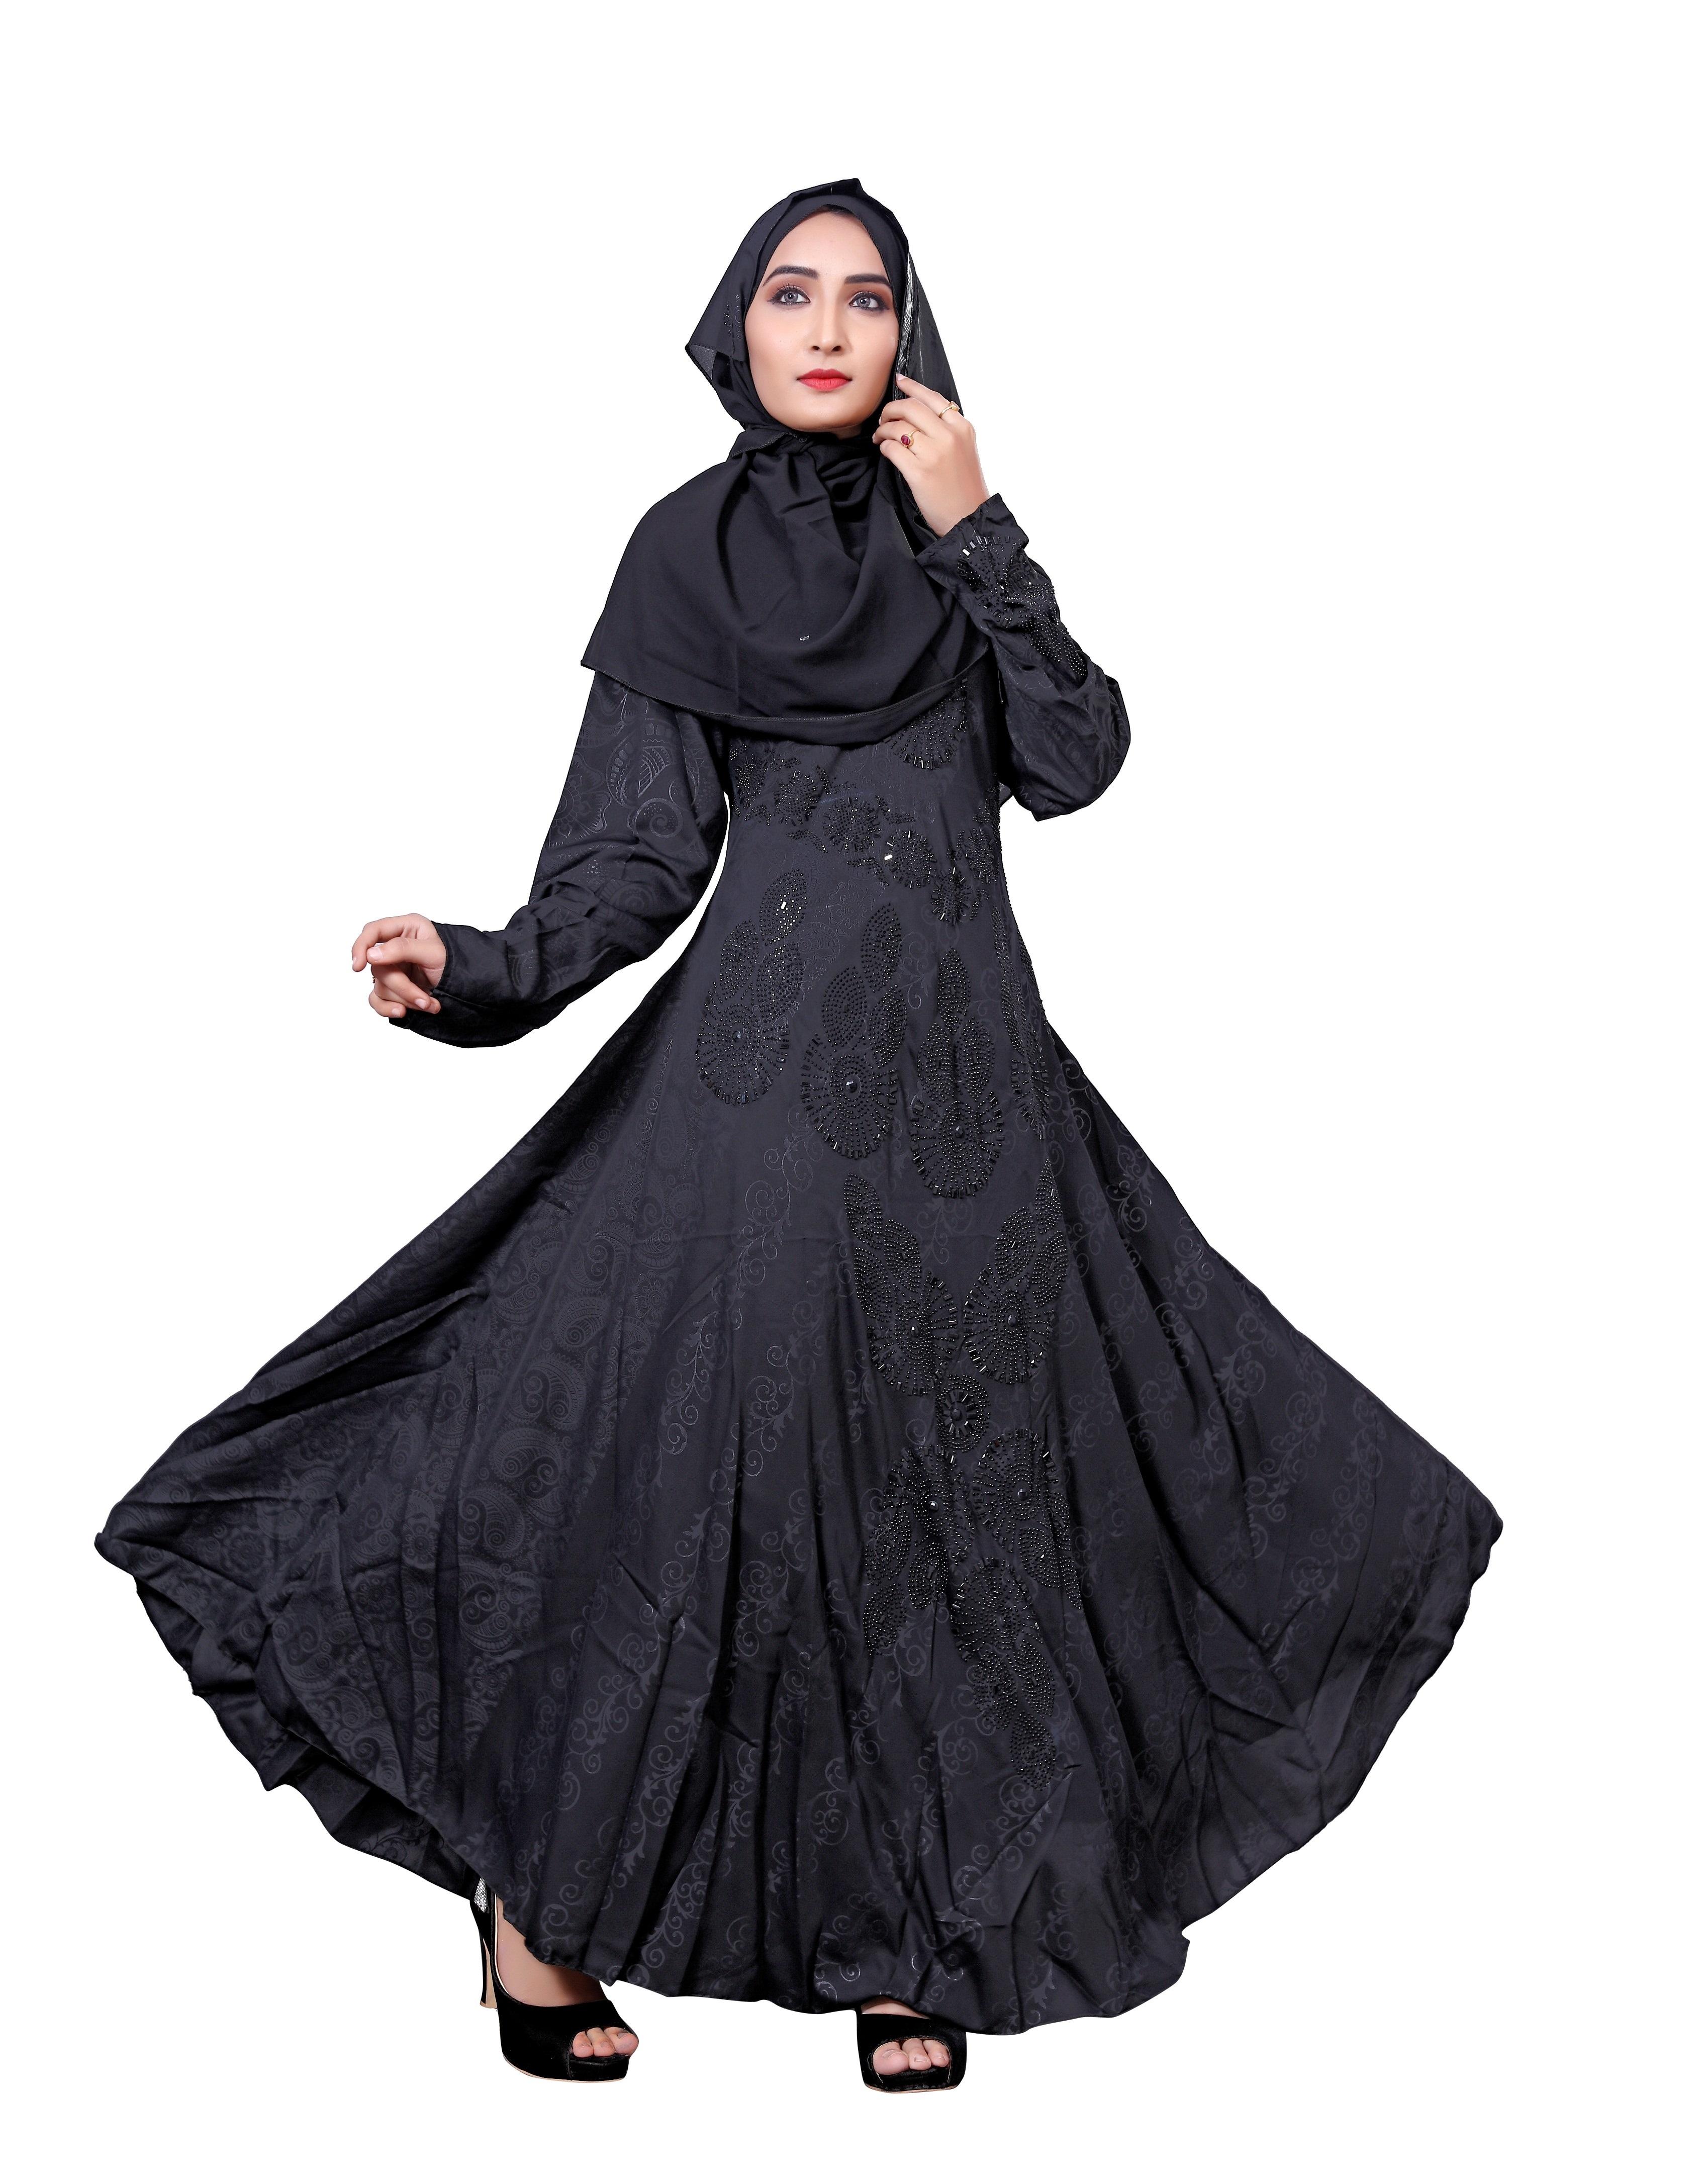 83b166bd8267 Black Color Nida Abaya Burkha With Embossed Work For Women ...